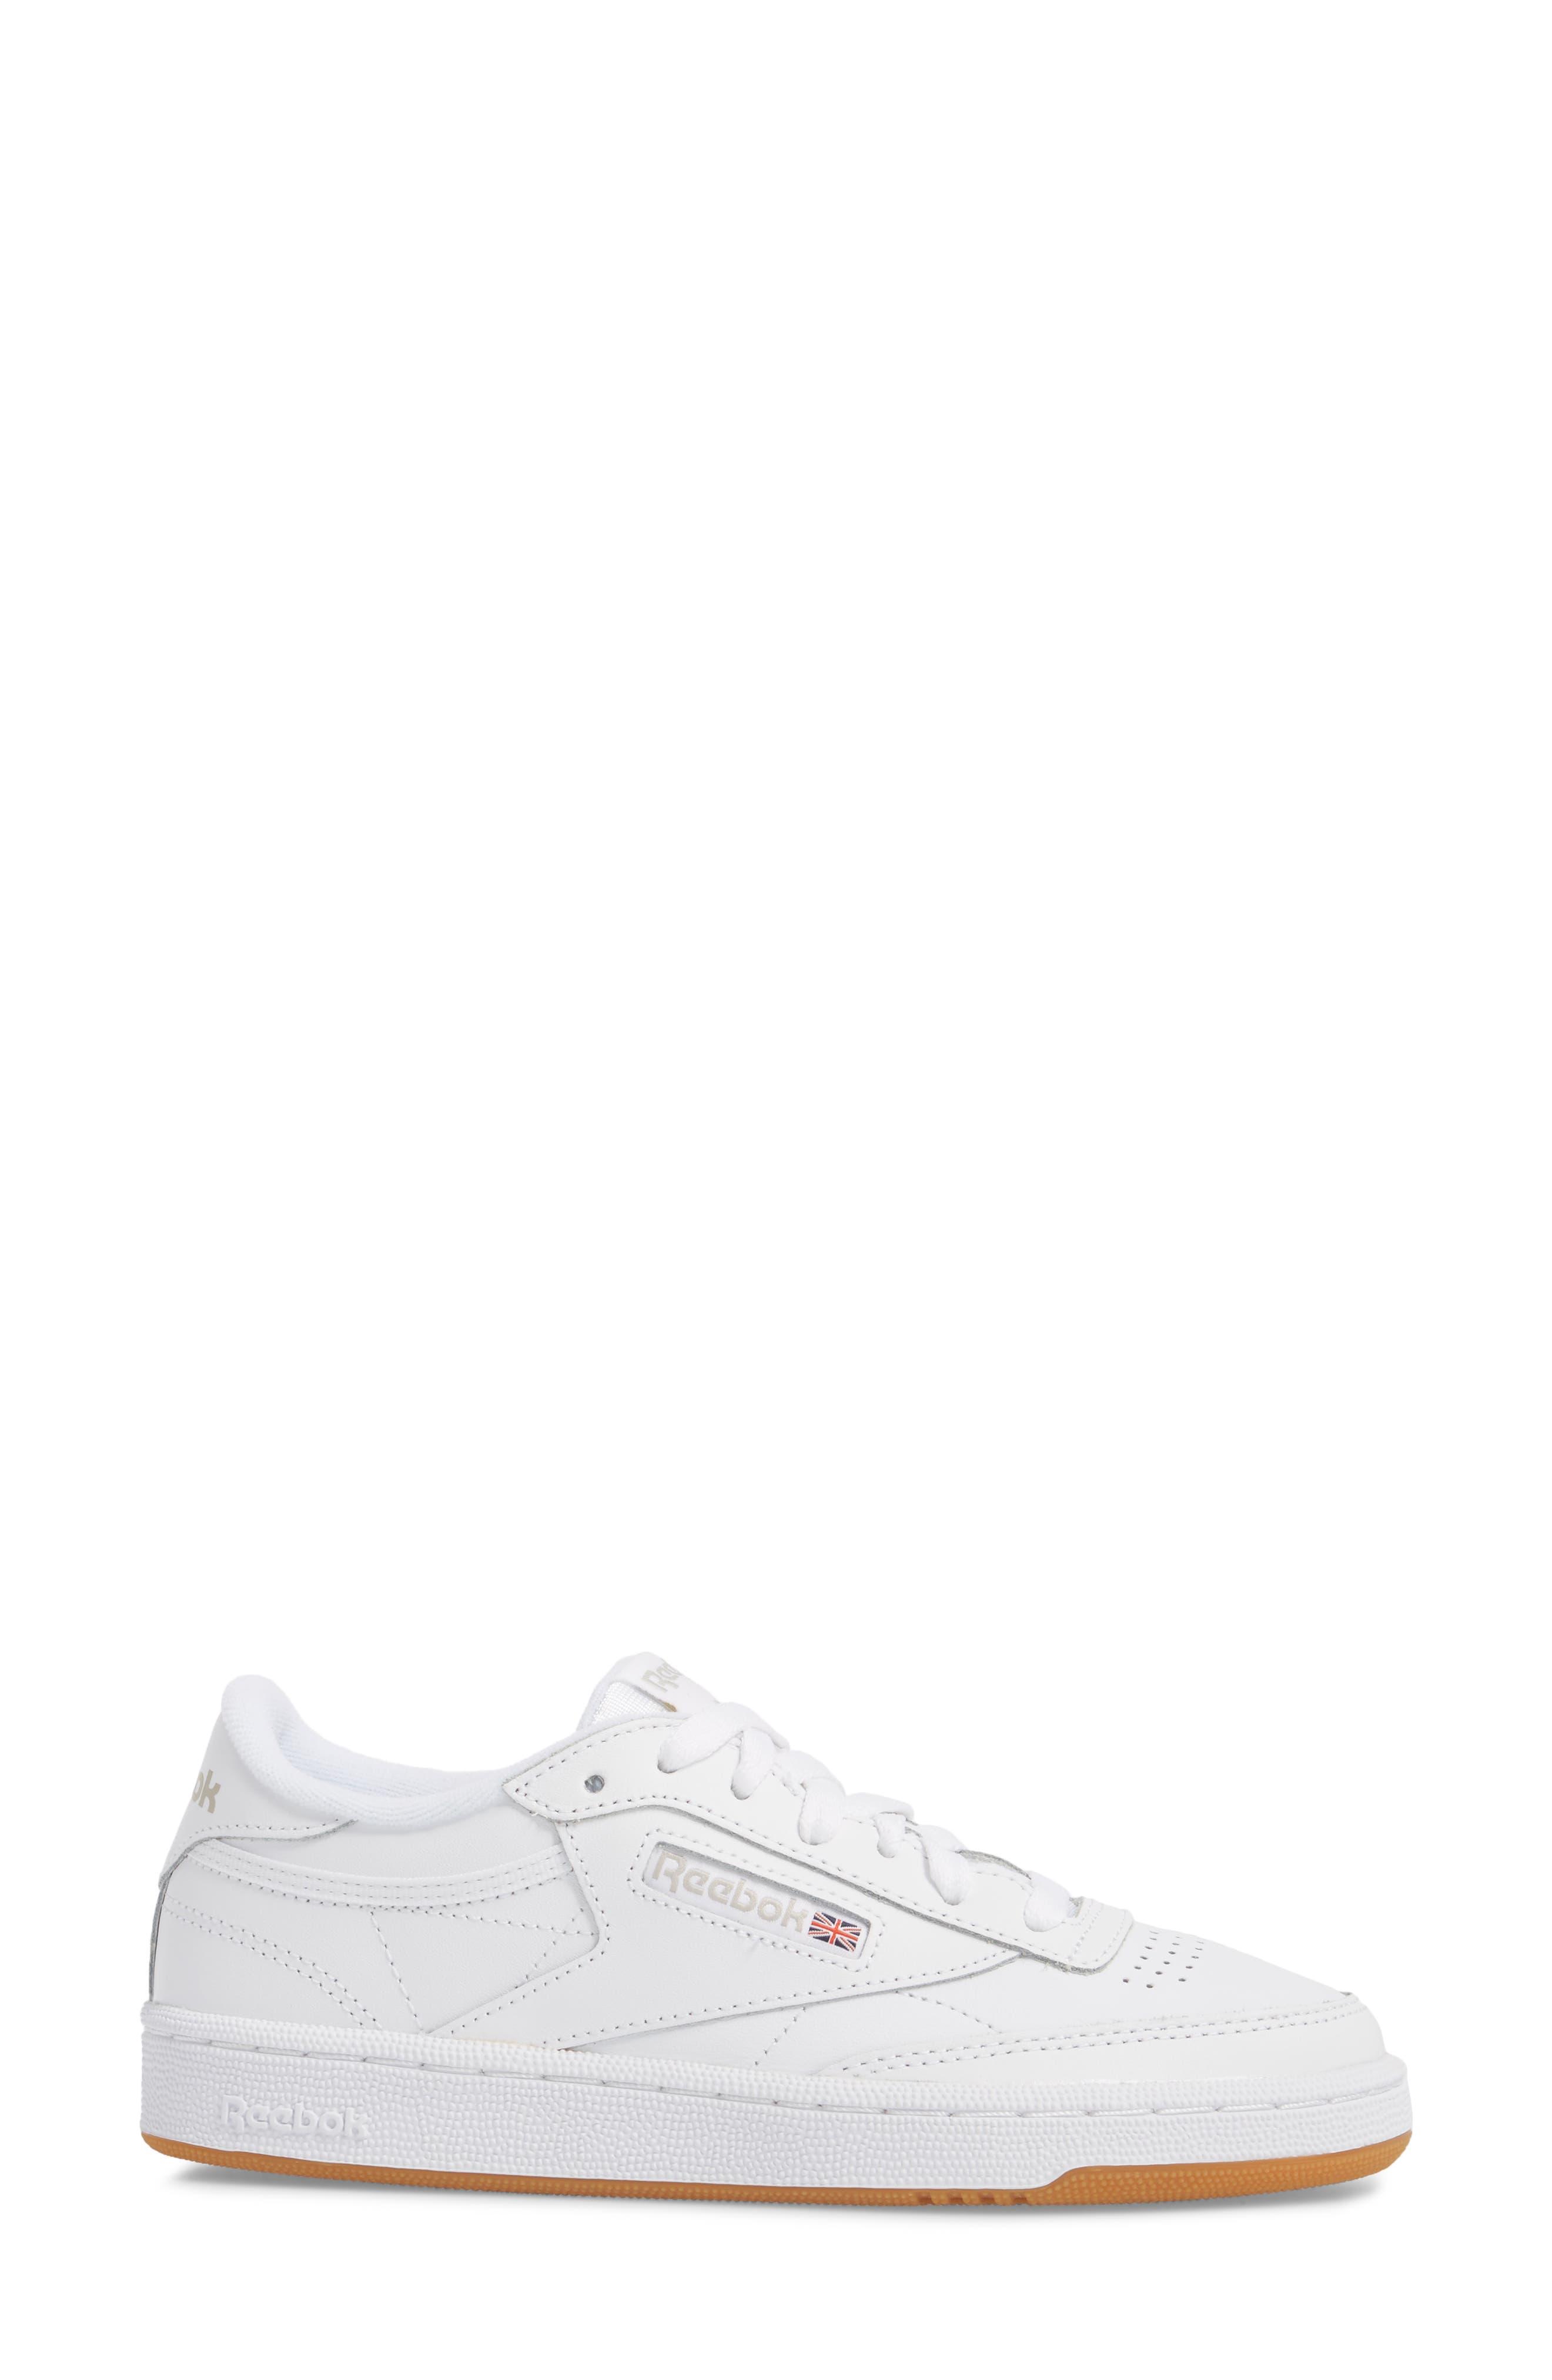 REEBOK, Club C 85 Sneaker, Alternate thumbnail 3, color, WHITE/ LIGHT GREY/ GUM